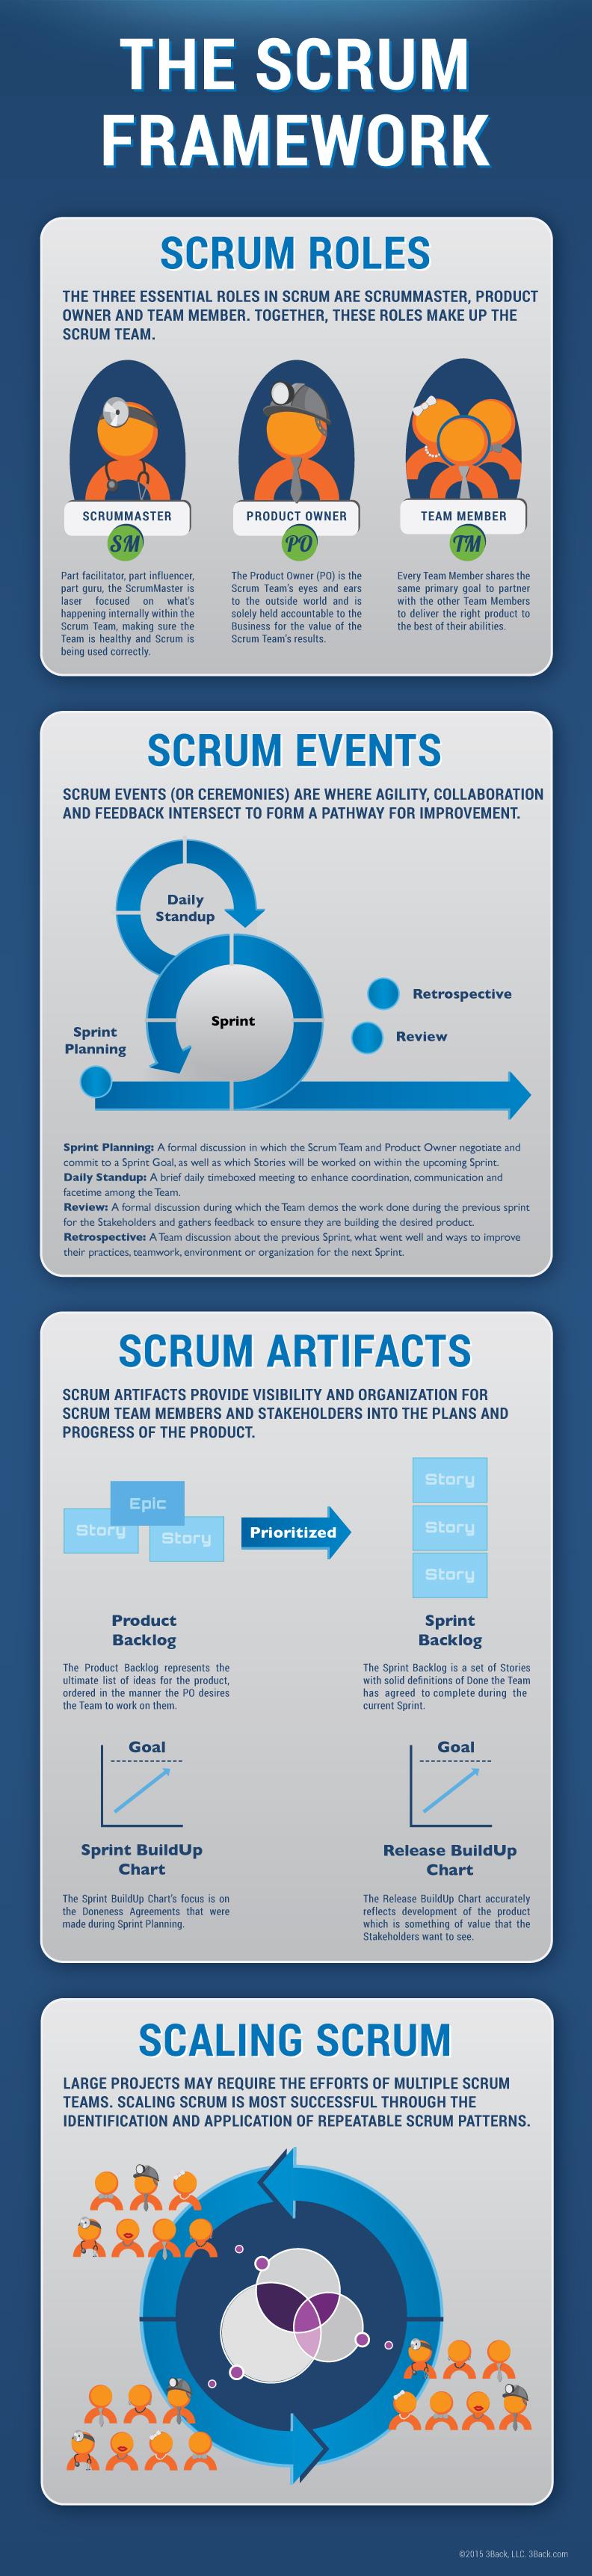 Scrum_Framework_Infographic